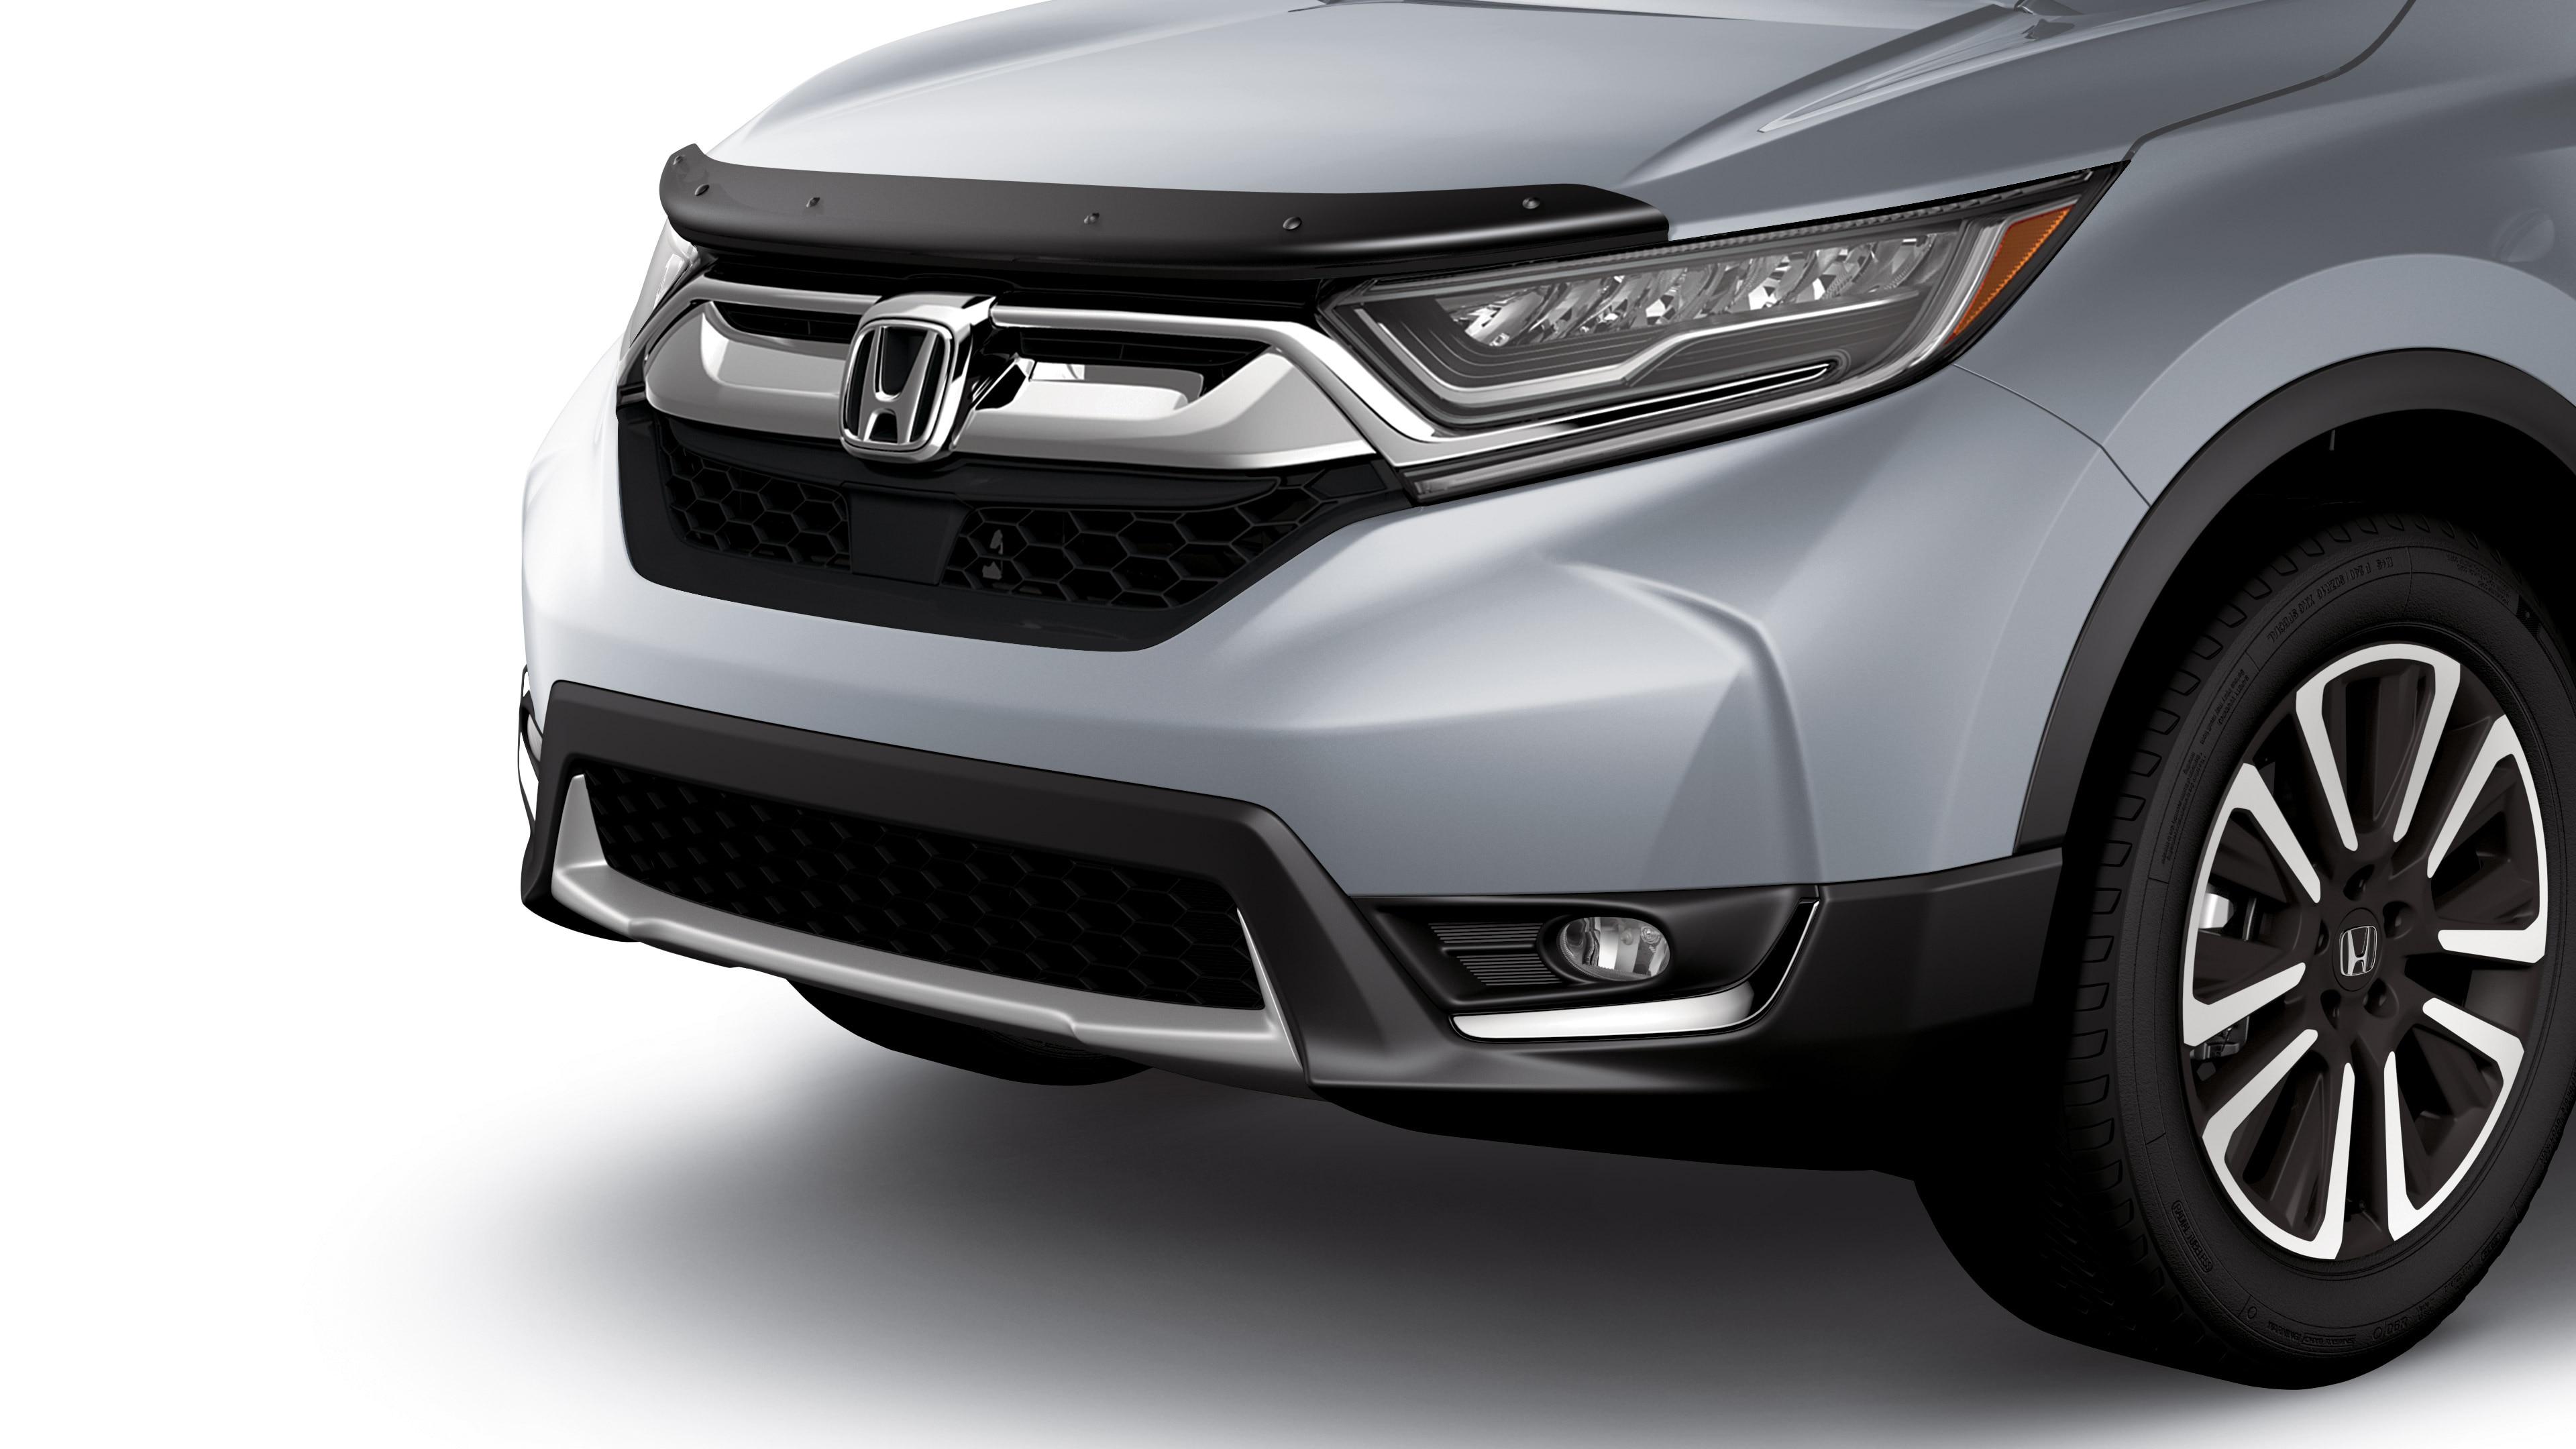 Accessories 2019 Cr V Honda Canada Pilot Trailer Wiring Module Hood Edge Deflector